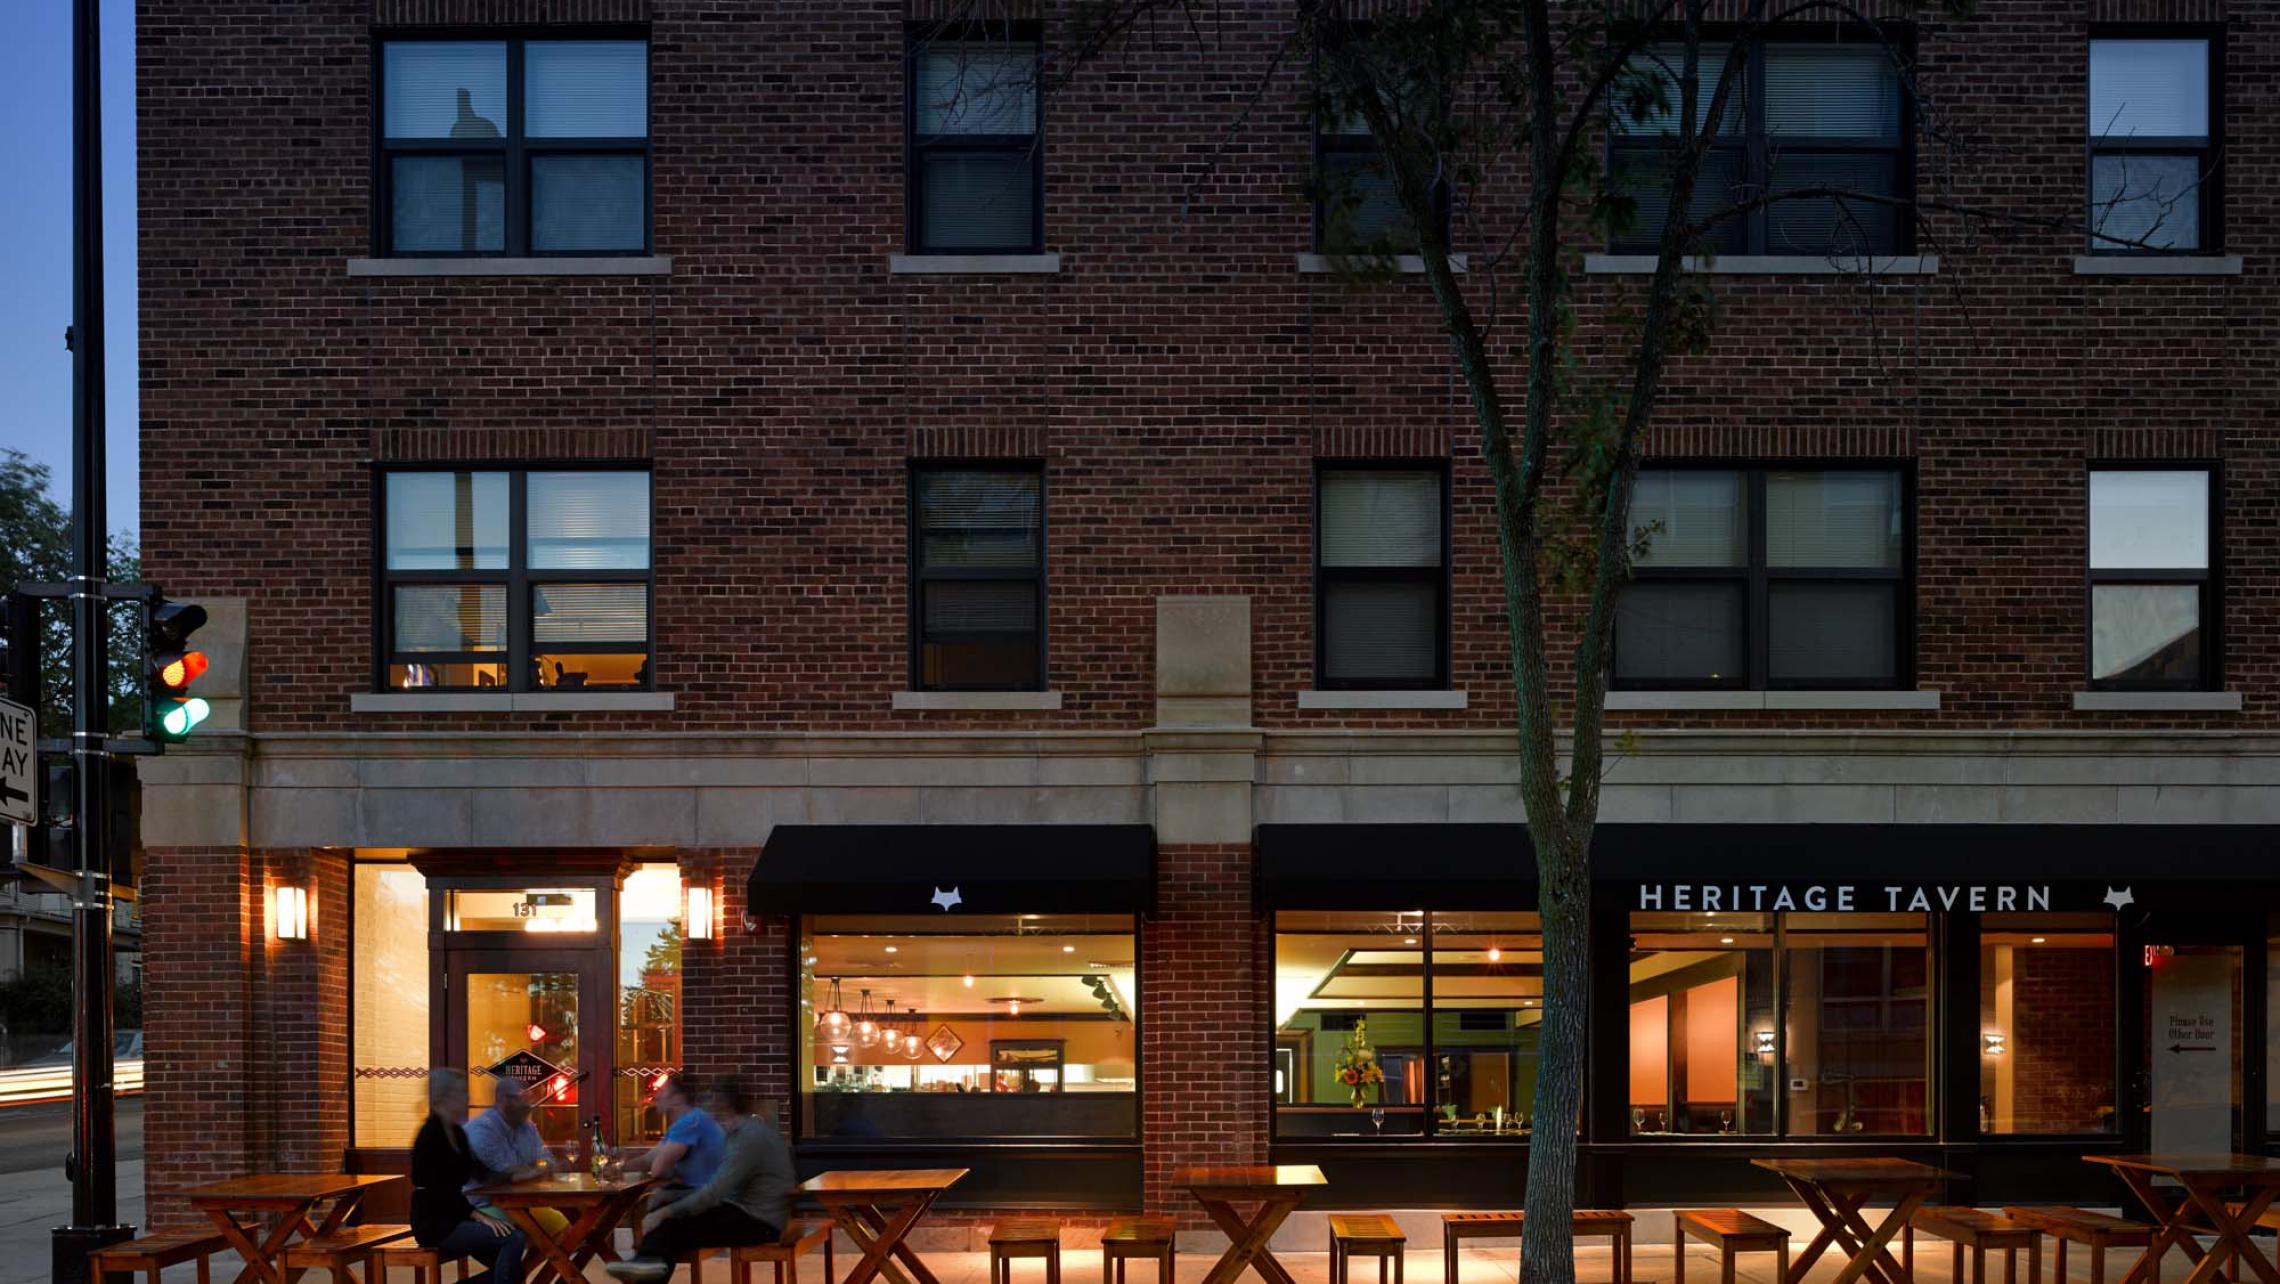 ULI Capitol Hill Apartments, Heritage Tavern